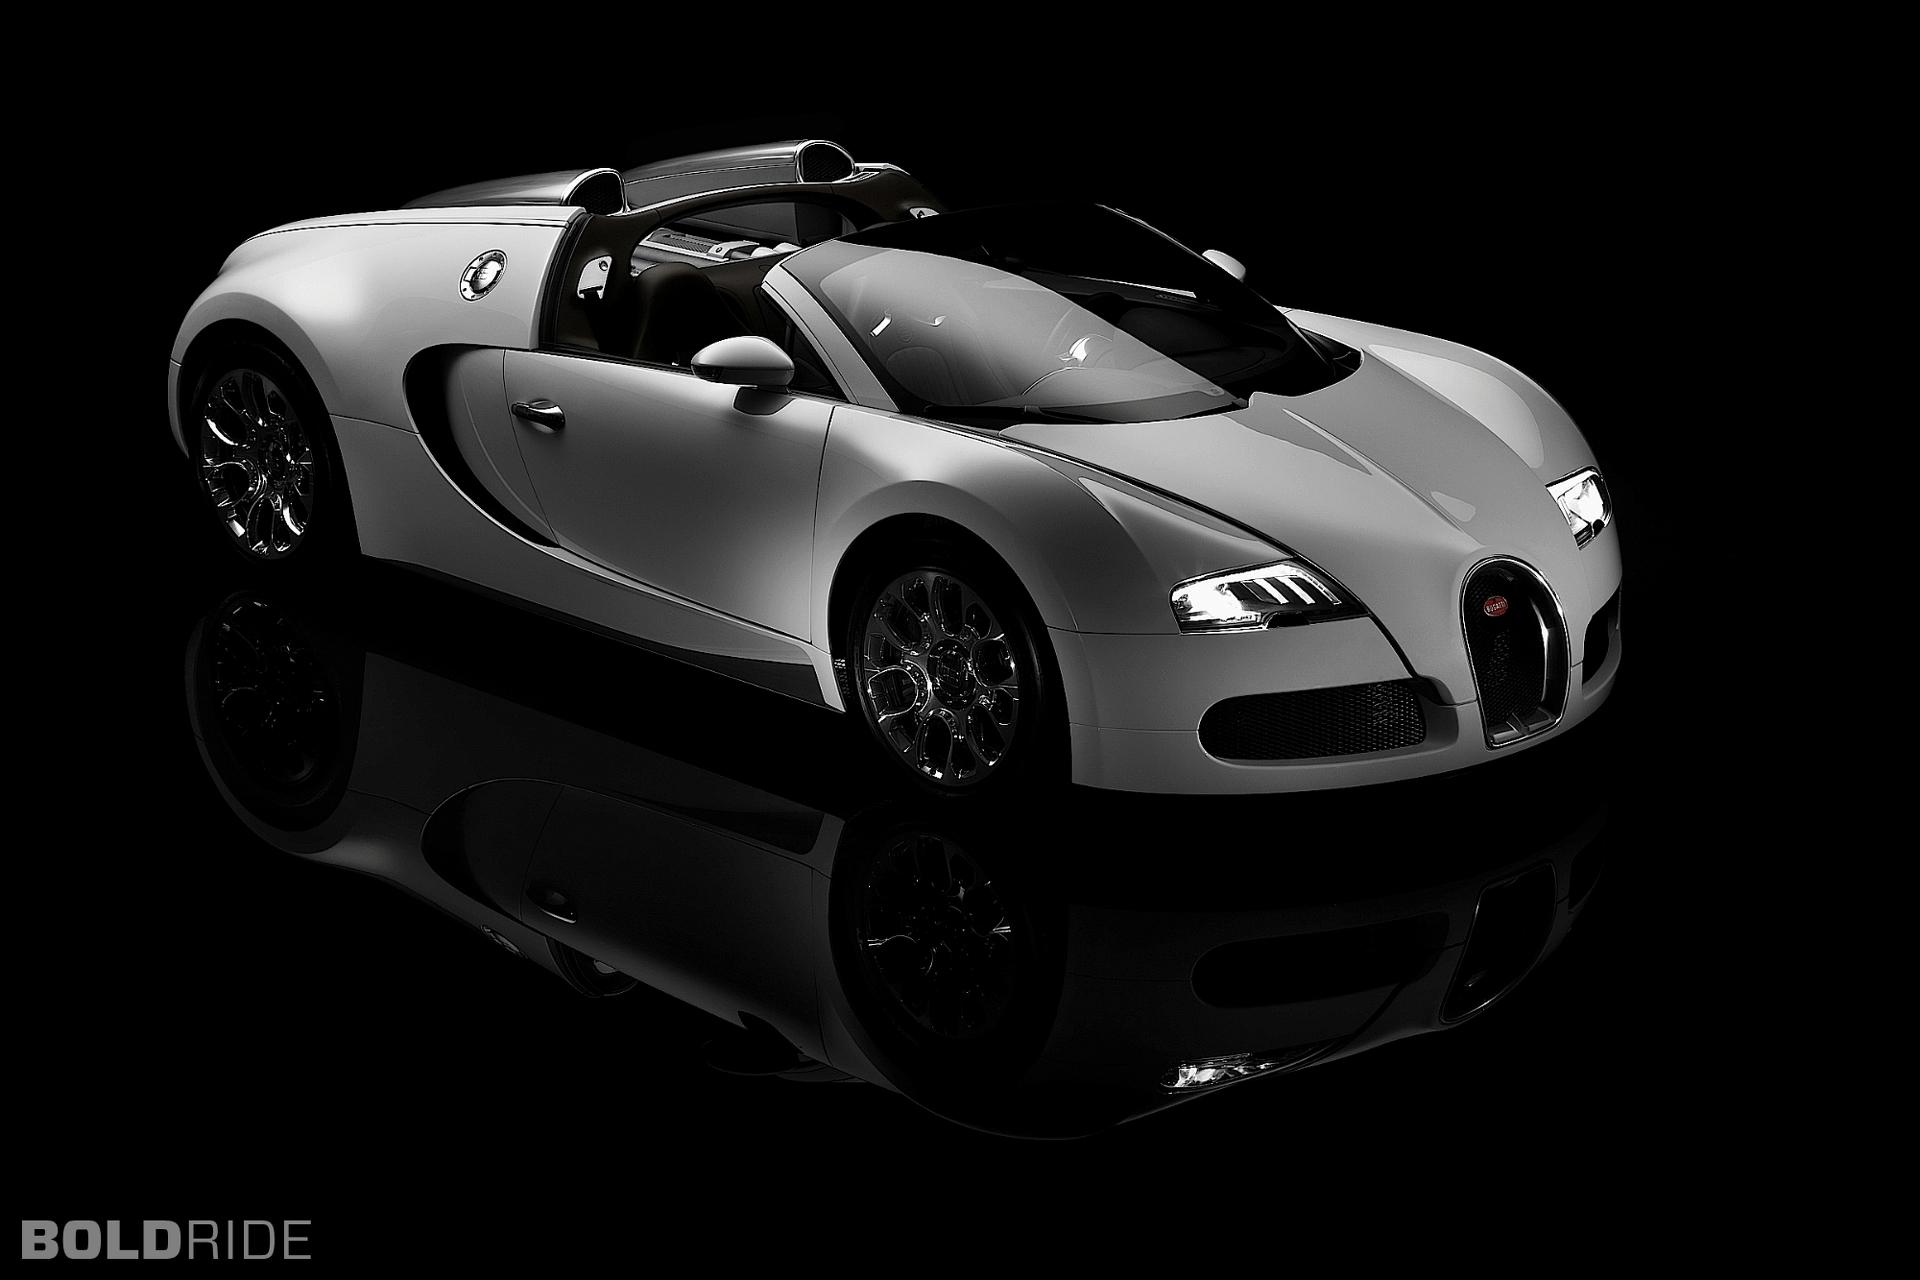 Https www motor1 com news 79526 bugatti veyron grand sport bugatti general supercar convertible sports car france 200mph 2000 2009 0 60 in under 3